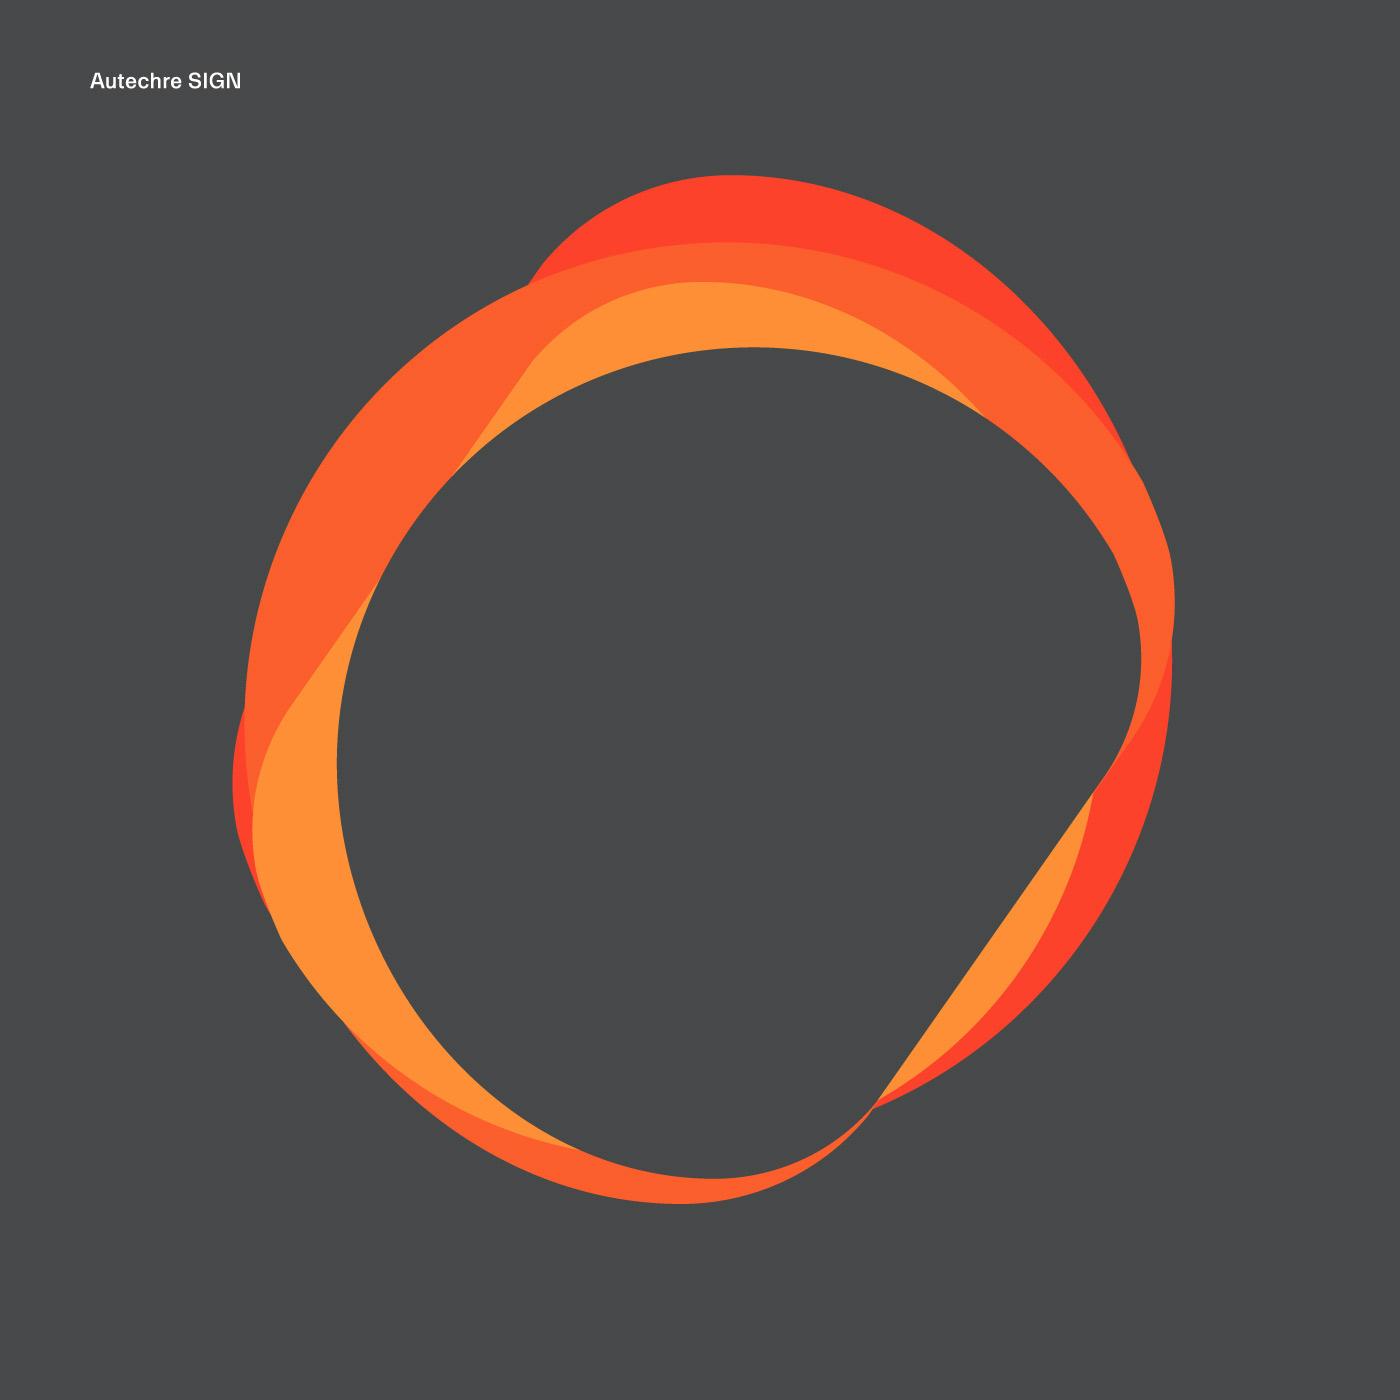 autechre SIGN new album art cover Electronic Music Duo Autechre Announce New Album SIGN